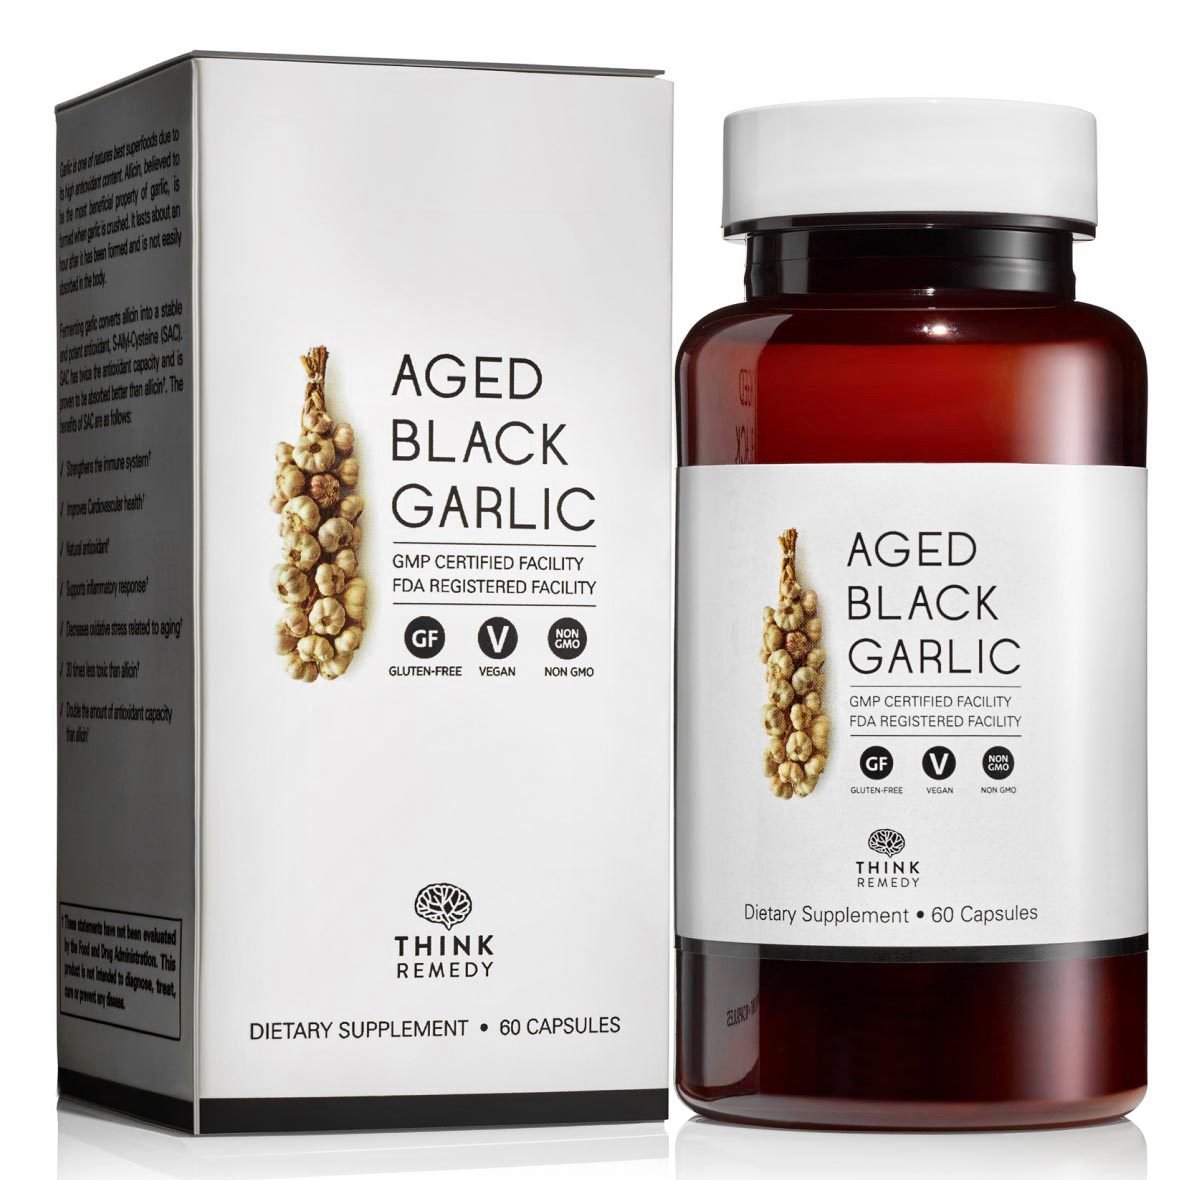 Aged Black Garlic Capsules - Garlic Pills for High Blood Pressure and Cholesterol Support - Less Odor - Potent Antioxidant - 60 Capsules - Allium Sativum Supplement - More Effective than Allicin